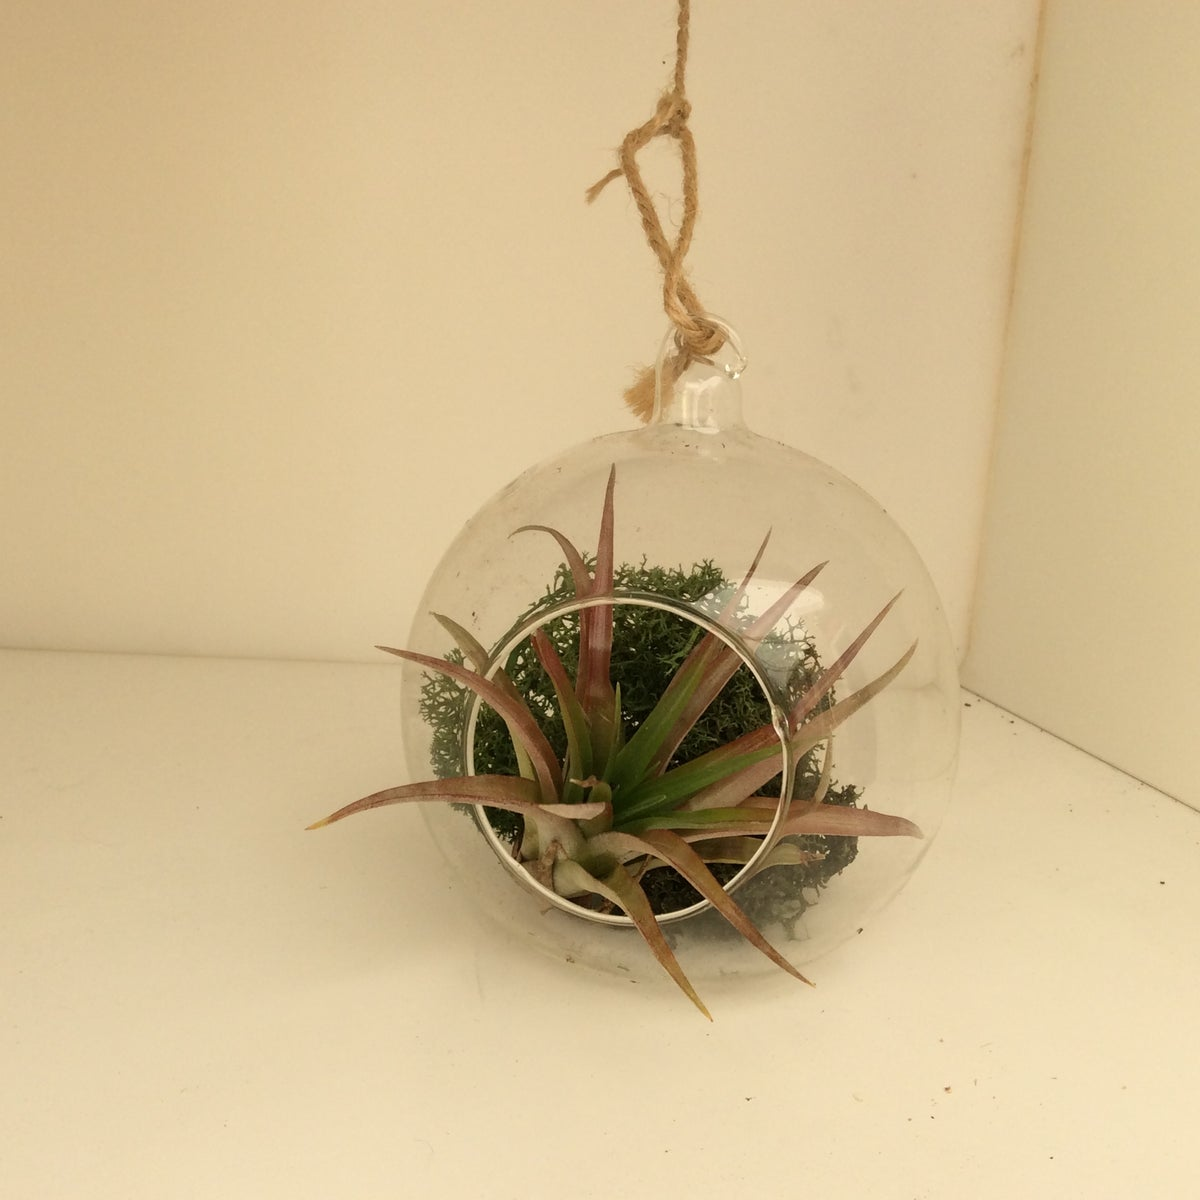 Image of Tillandsia in glass